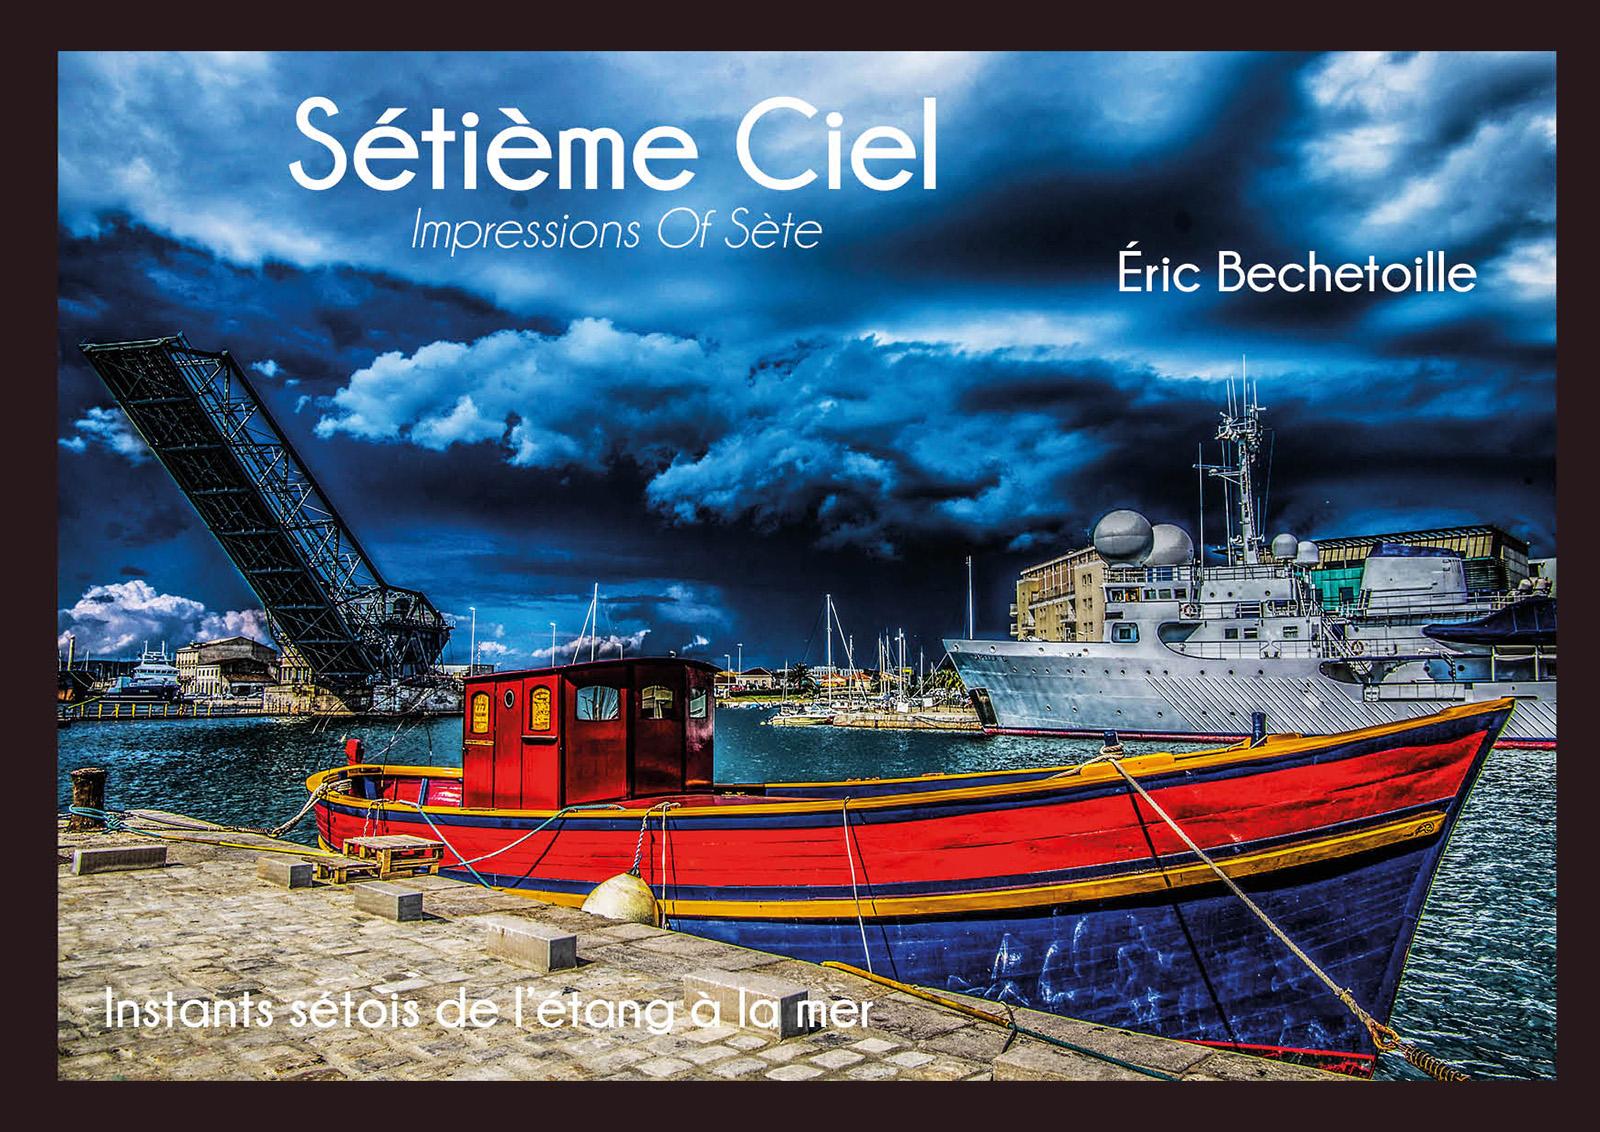 Sétième Ciel, Impressions Of Sète